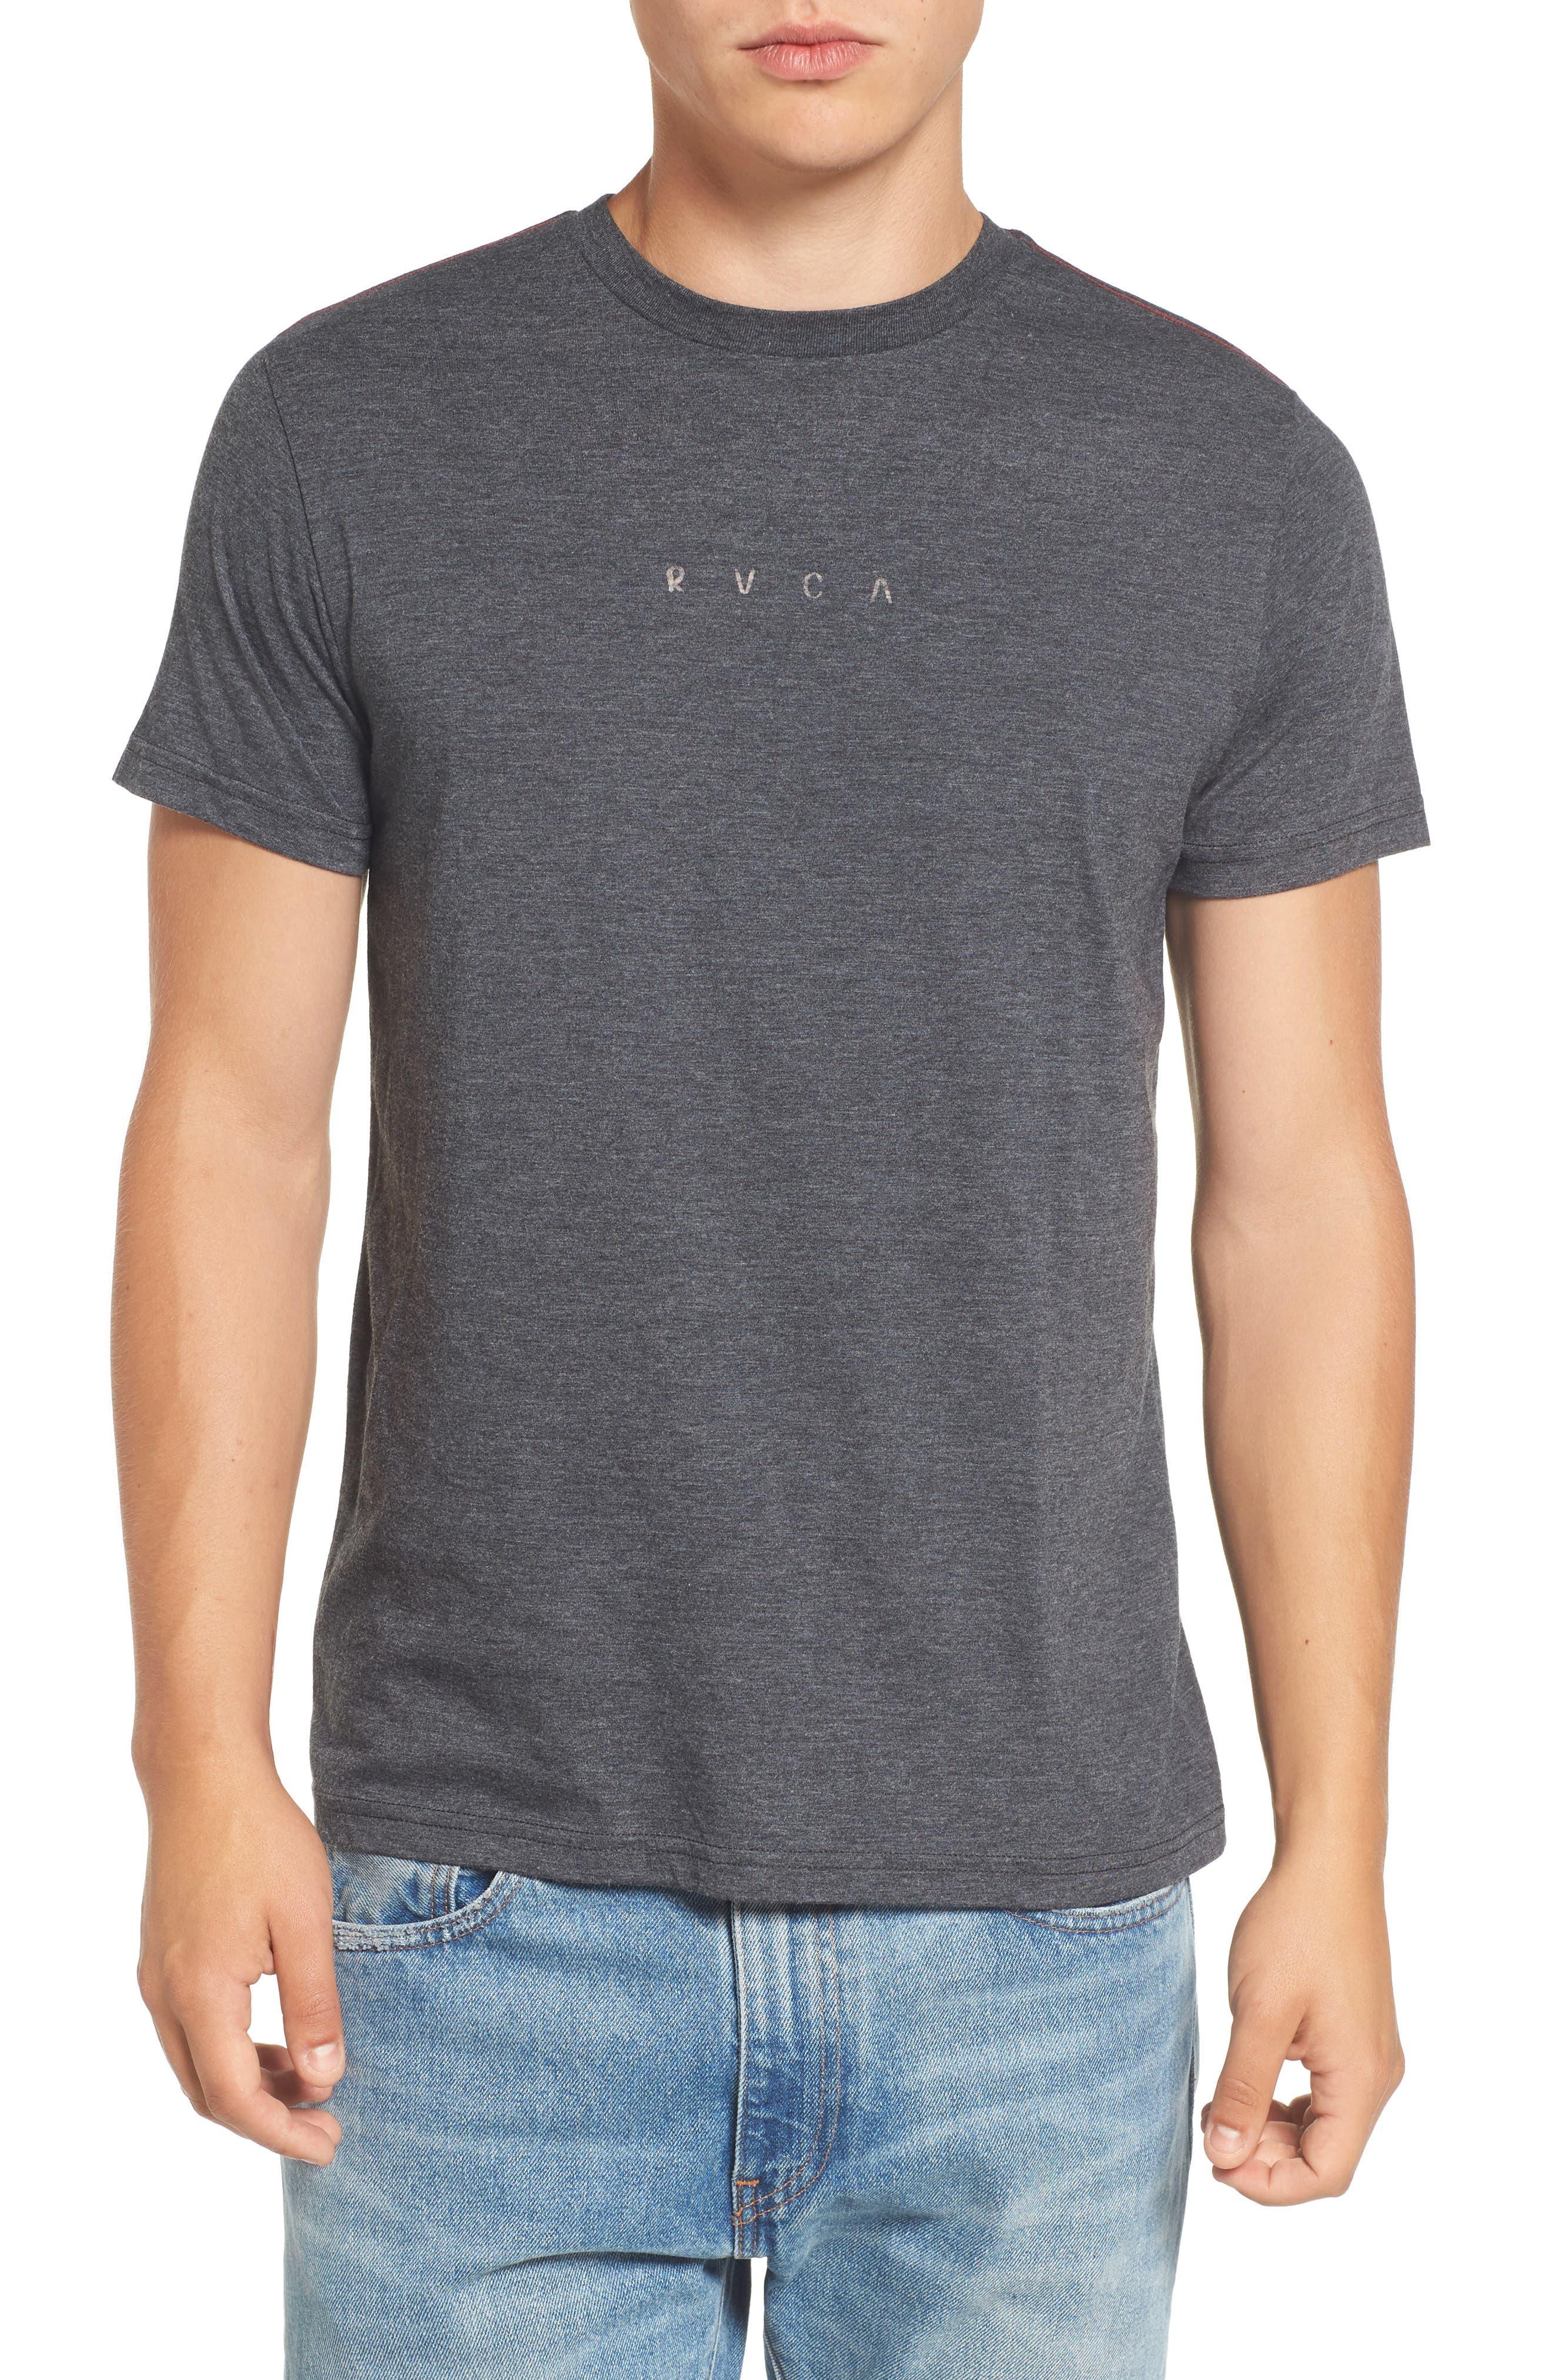 Snooze Cloud Graphic T-Shirt,                         Main,                         color, 001